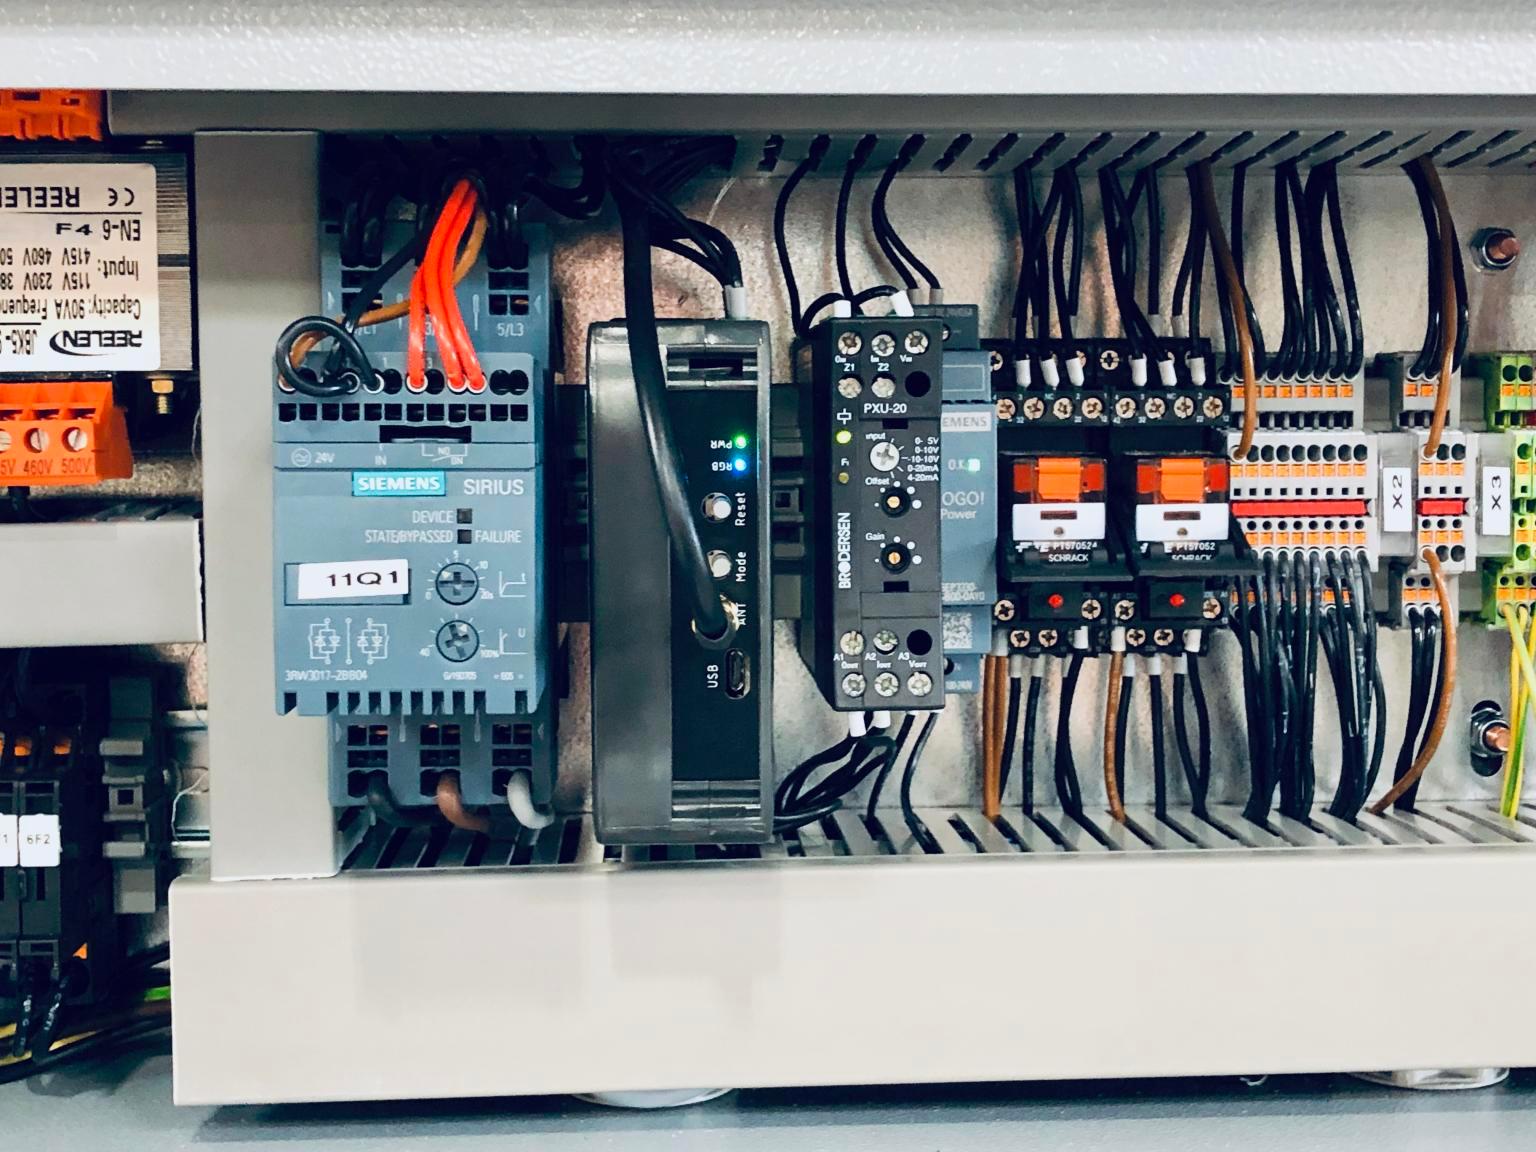 The D Zero installed in an industrial machine